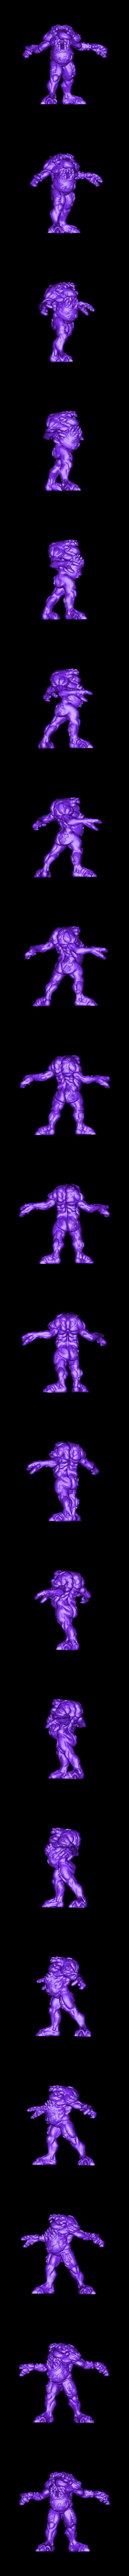 Demon3.stl Download free STL file 3x Demons • 3D printing object, duncanshadow